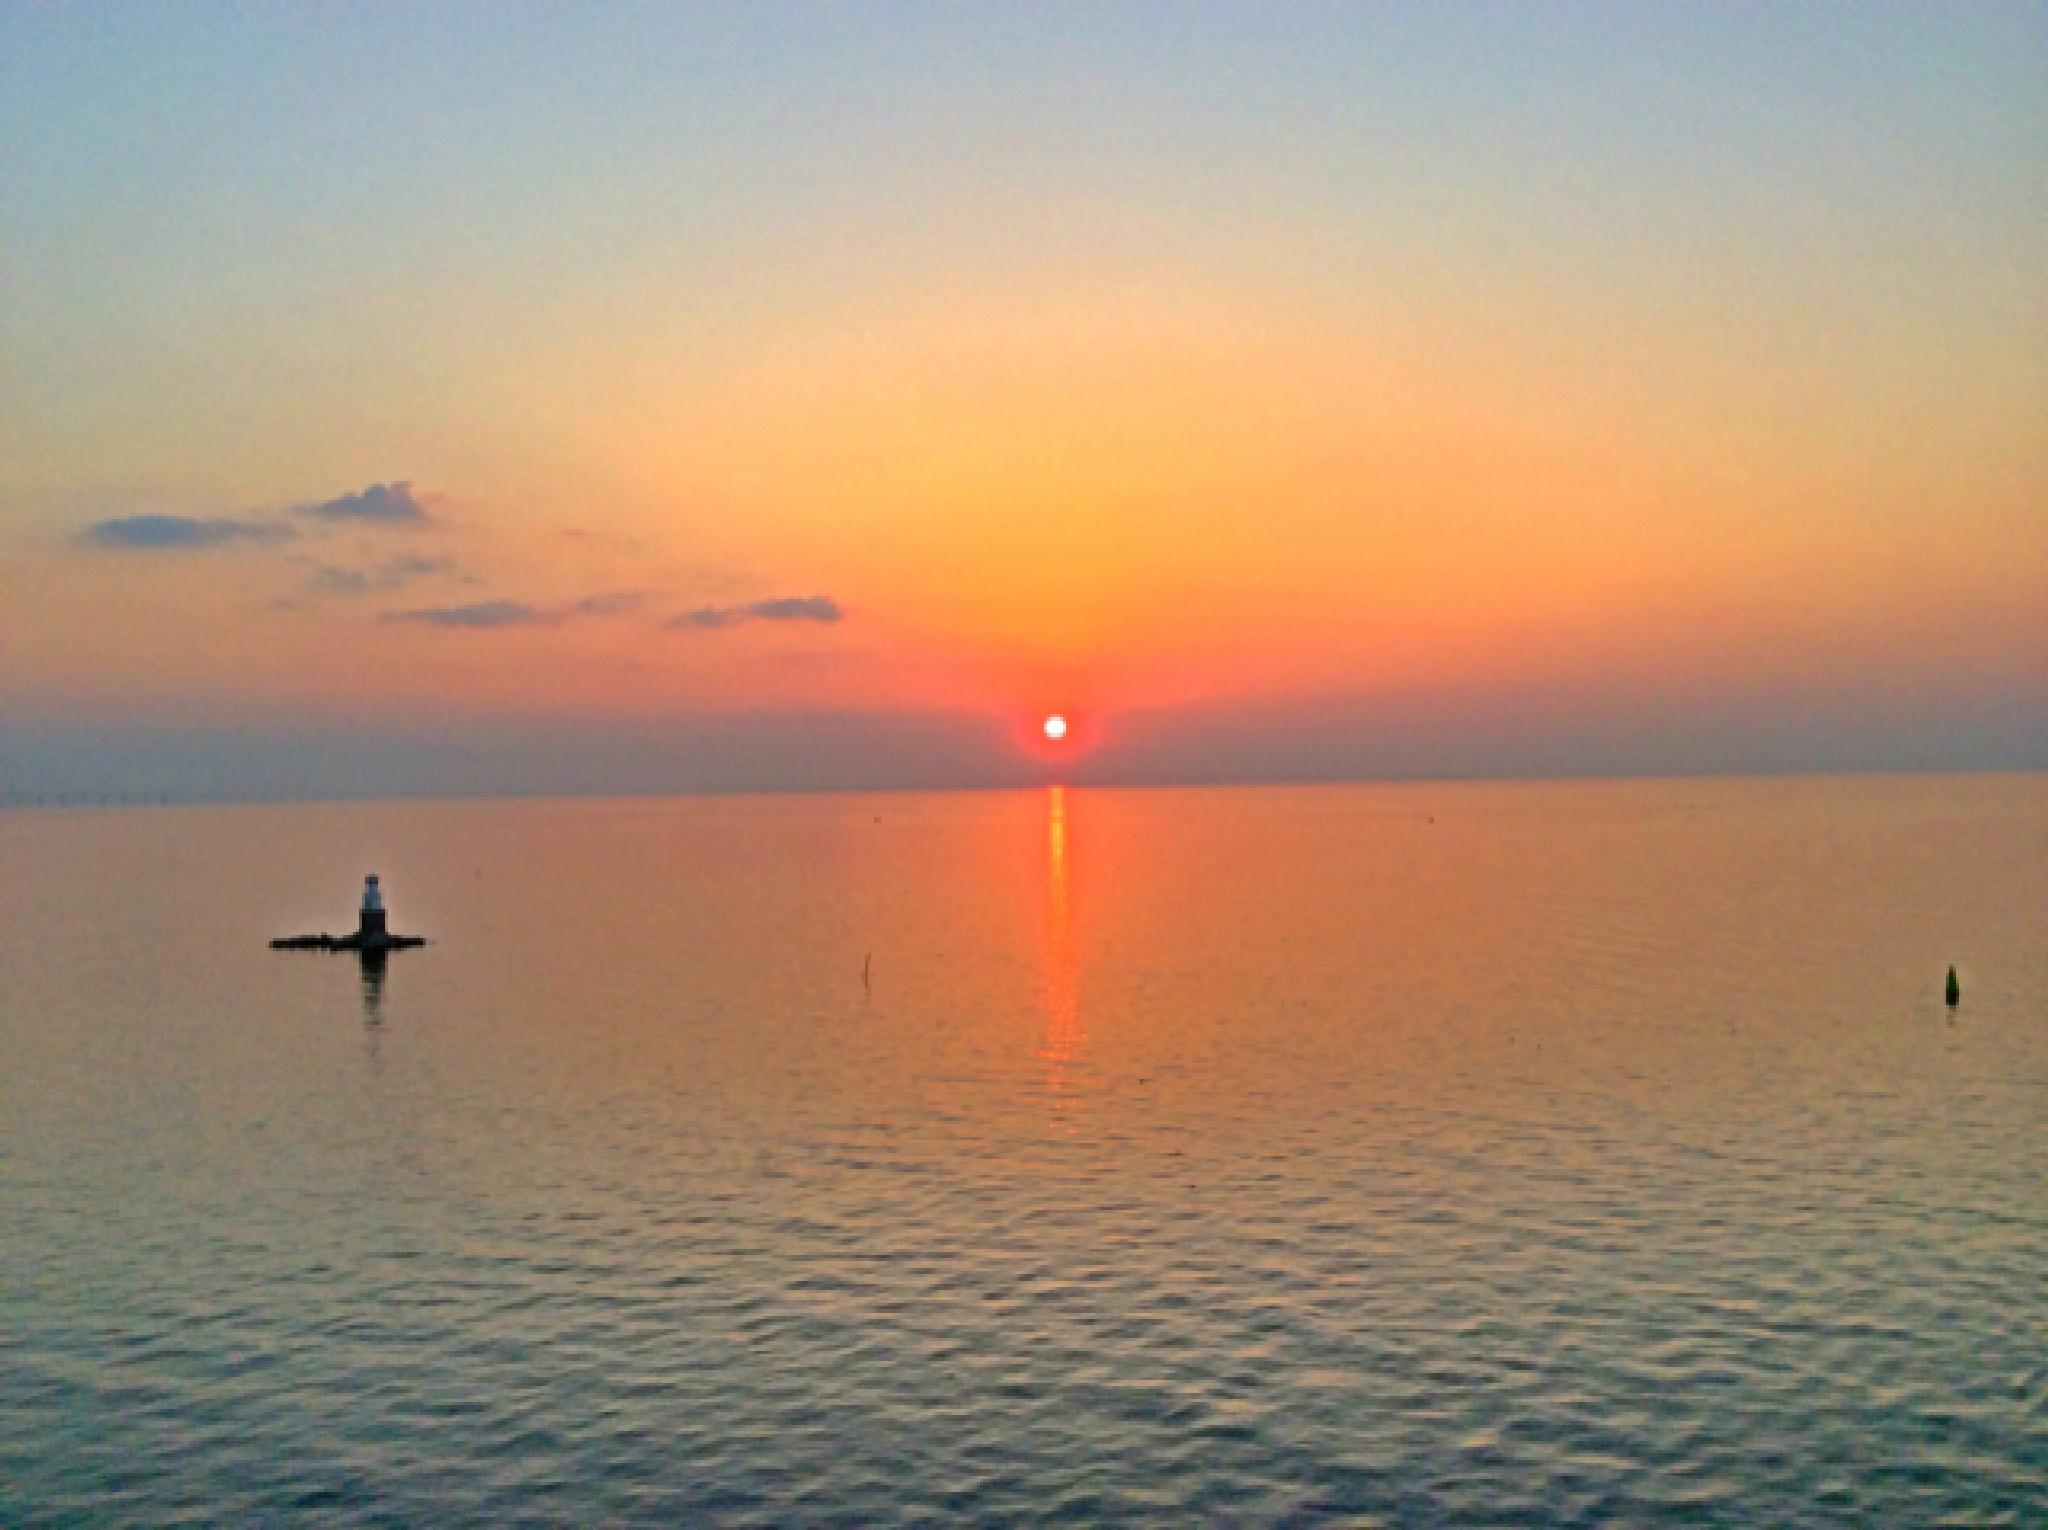 Sunset Malmoe @ Sea  by Johan Meding